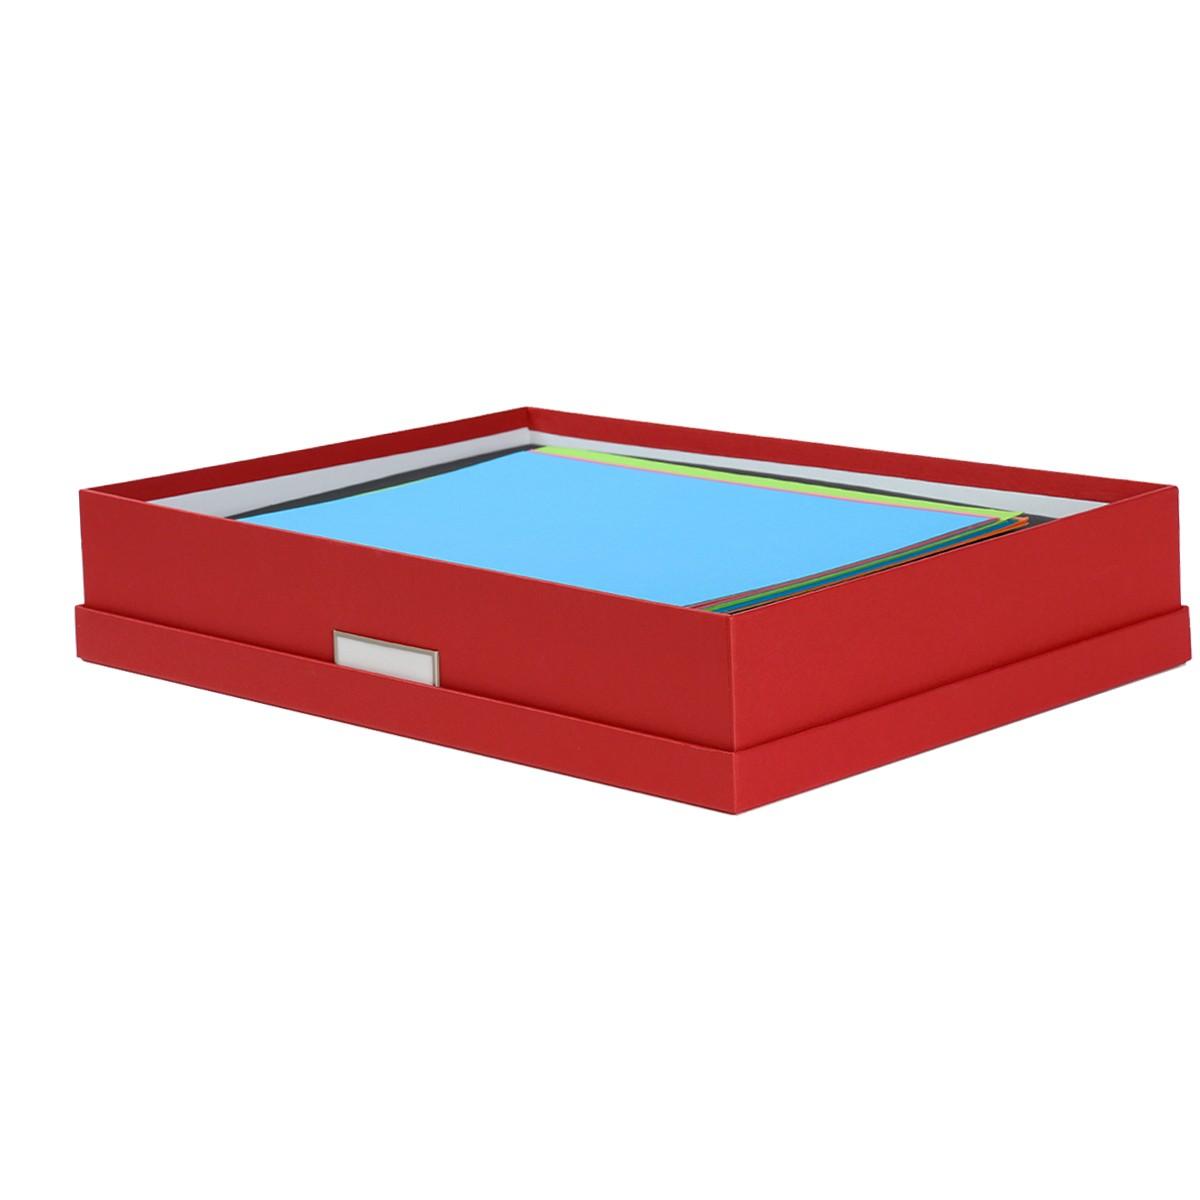 bo te a3 en carton rouge classement. Black Bedroom Furniture Sets. Home Design Ideas